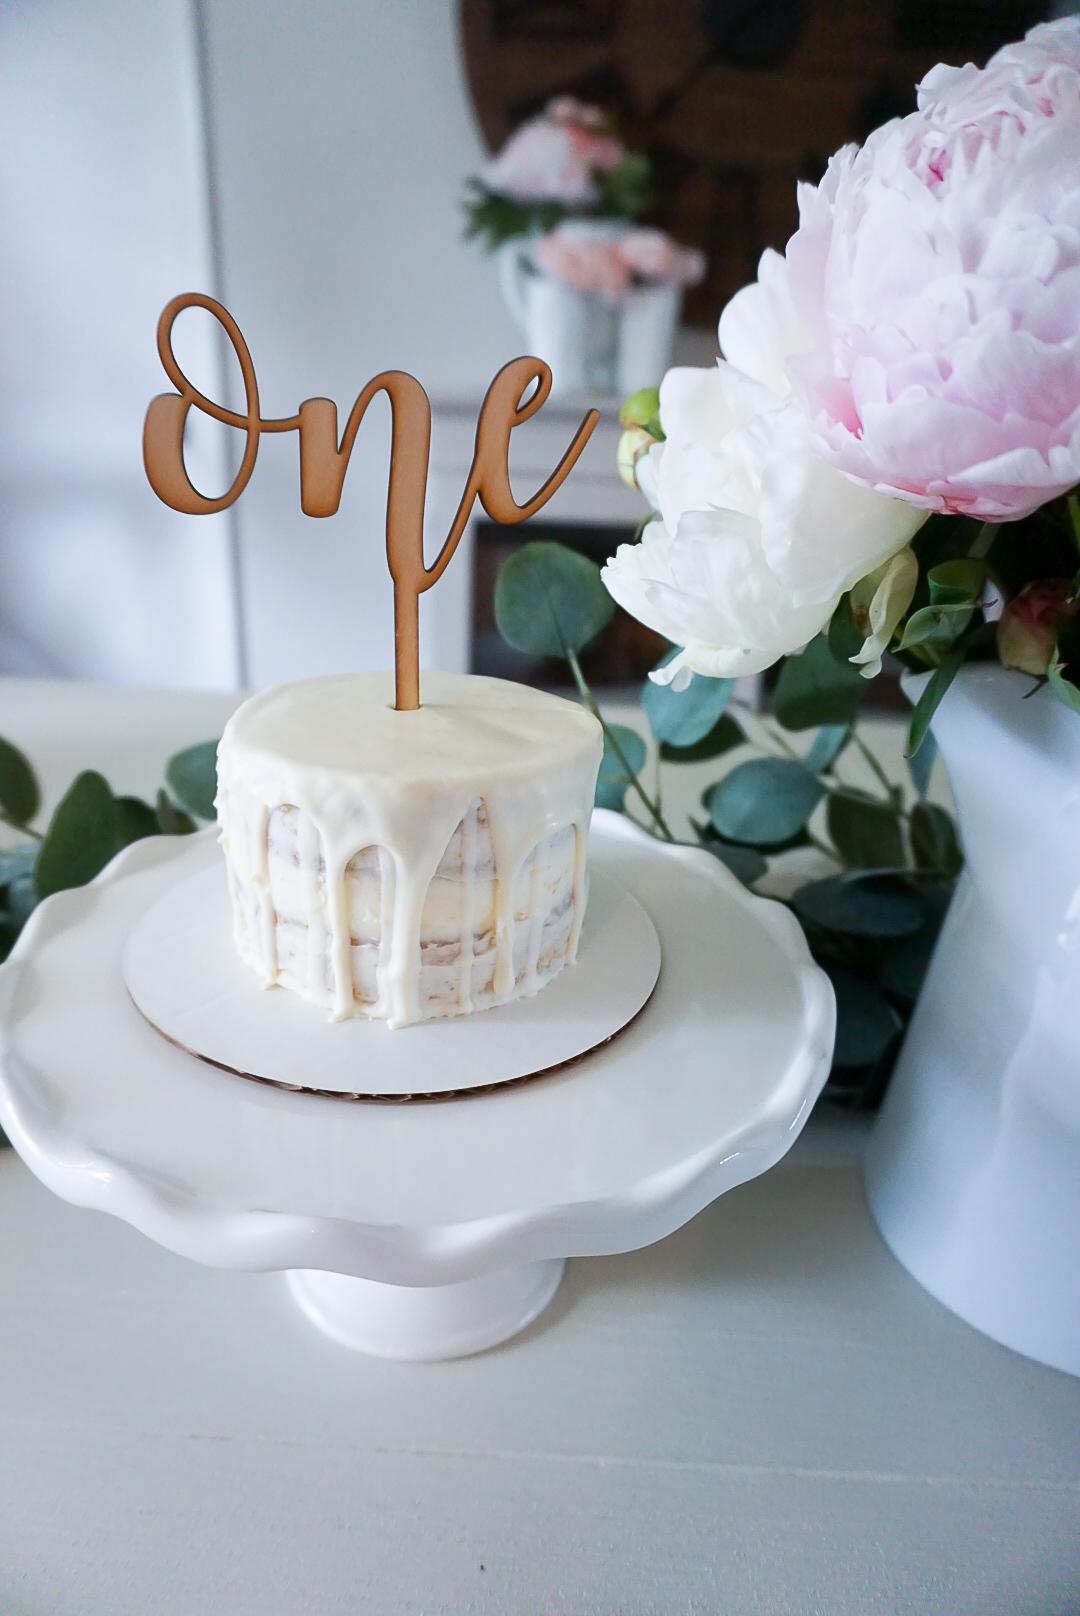 first birthday smash cake, simple smash cake, dye free smash cake, Baked Blessings by Lisa cake